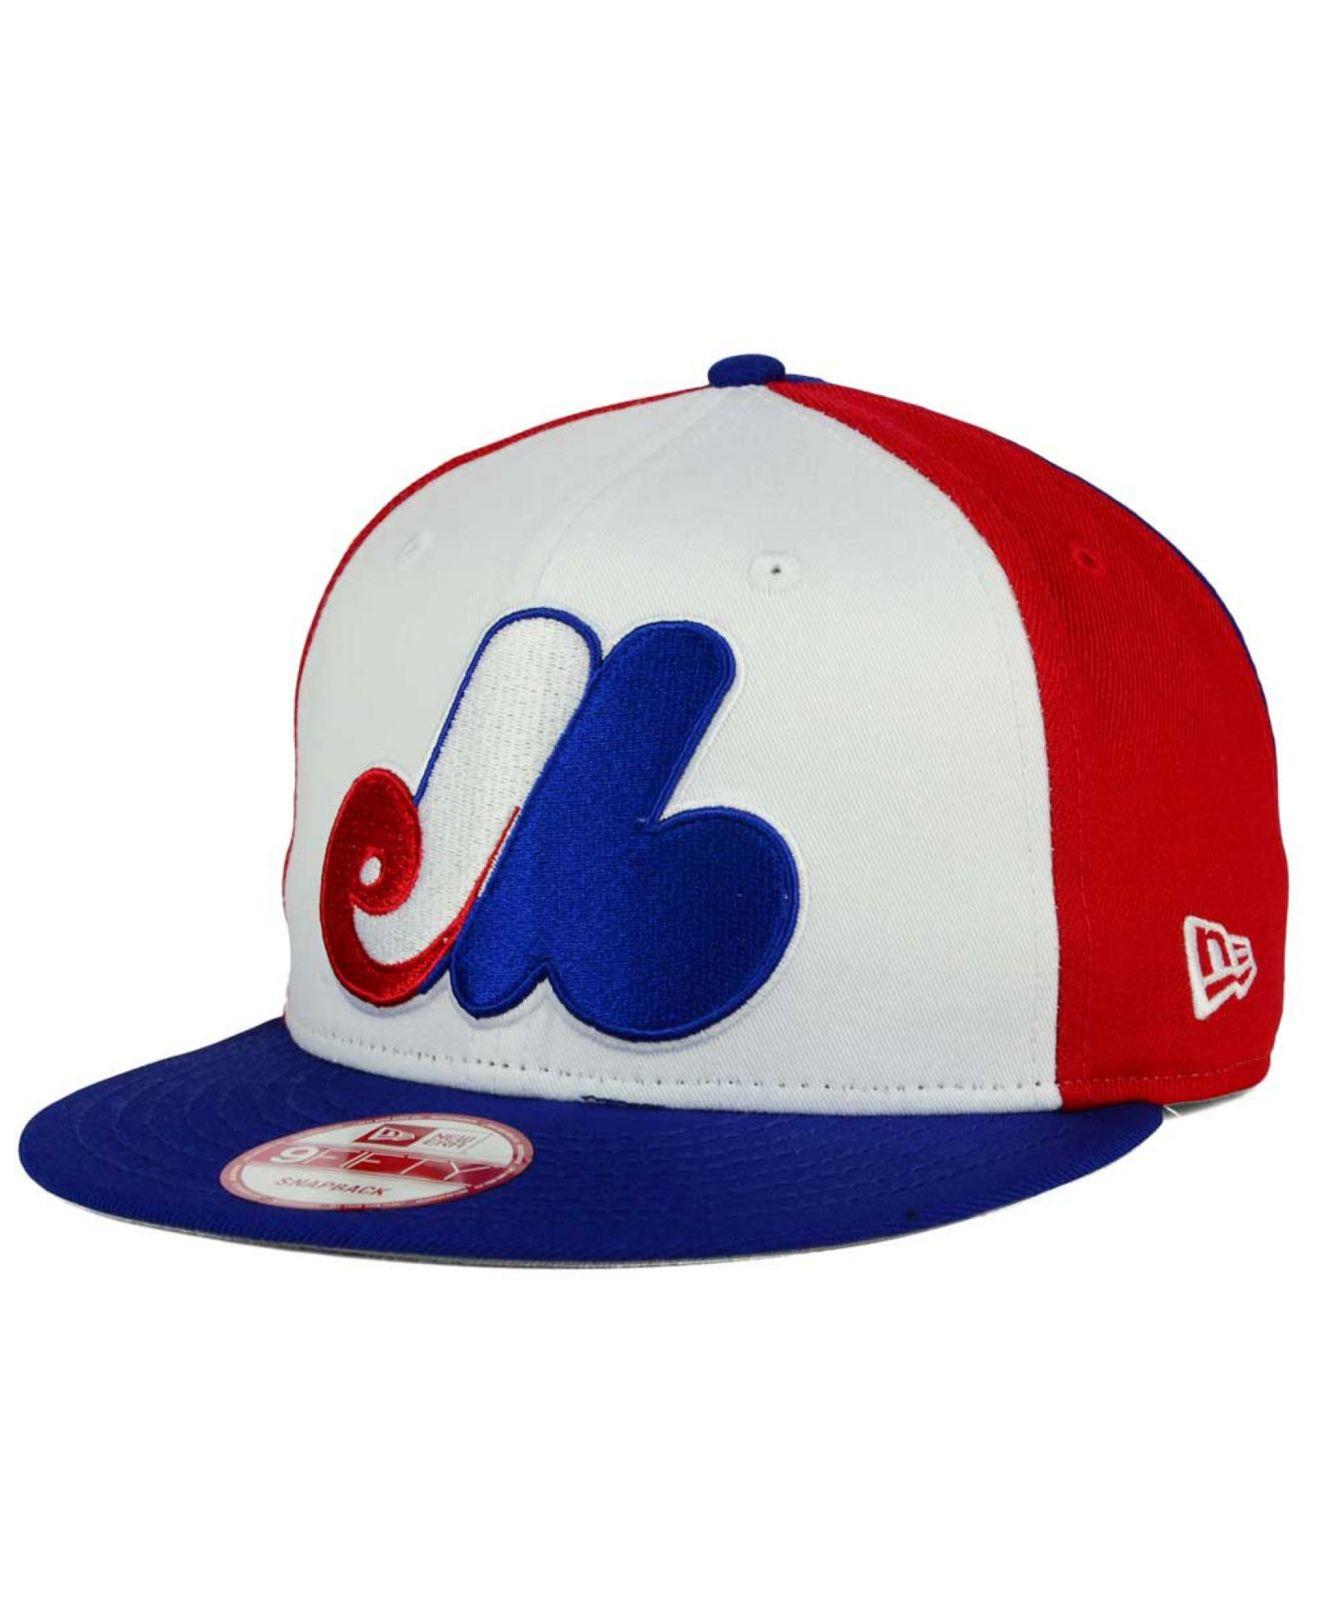 04da46b9def Lyst - Ktz Montreal Expos Biggie 9fifty Snapback Cap in White for Men